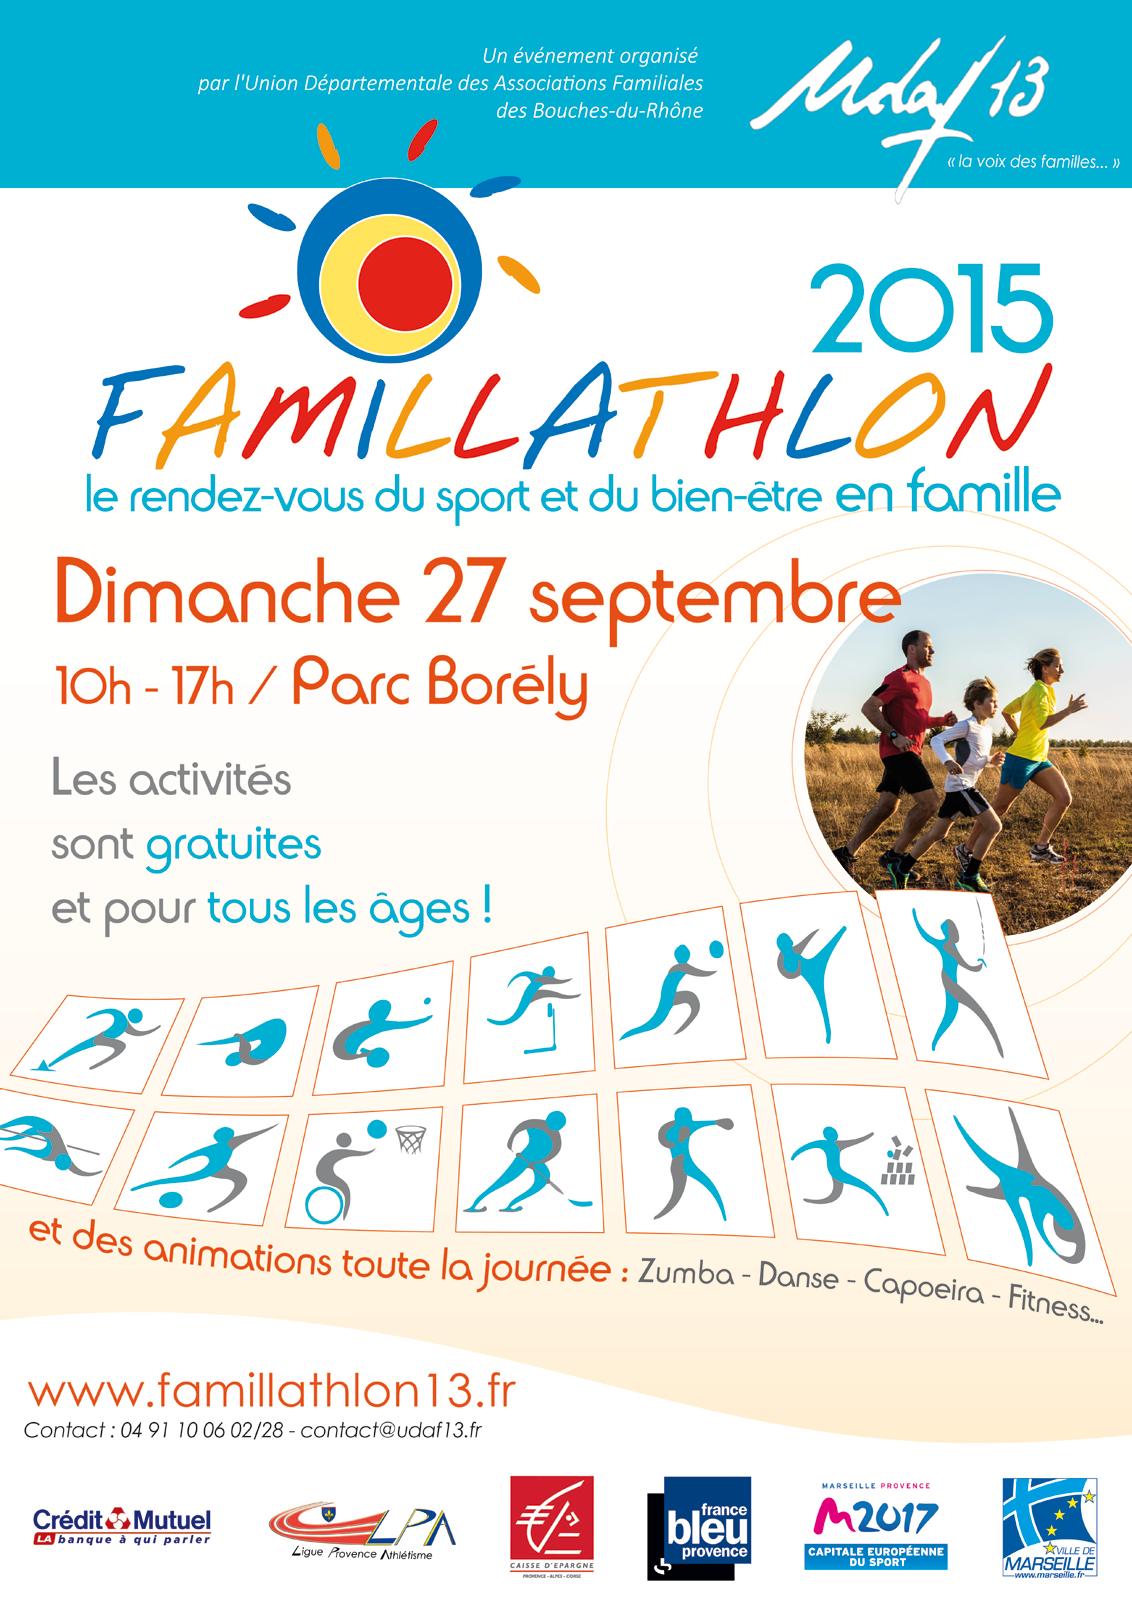 http://www.famillathlon13.fr/wp-content/uploads/2015/07/famillathlon_2015_A2.png